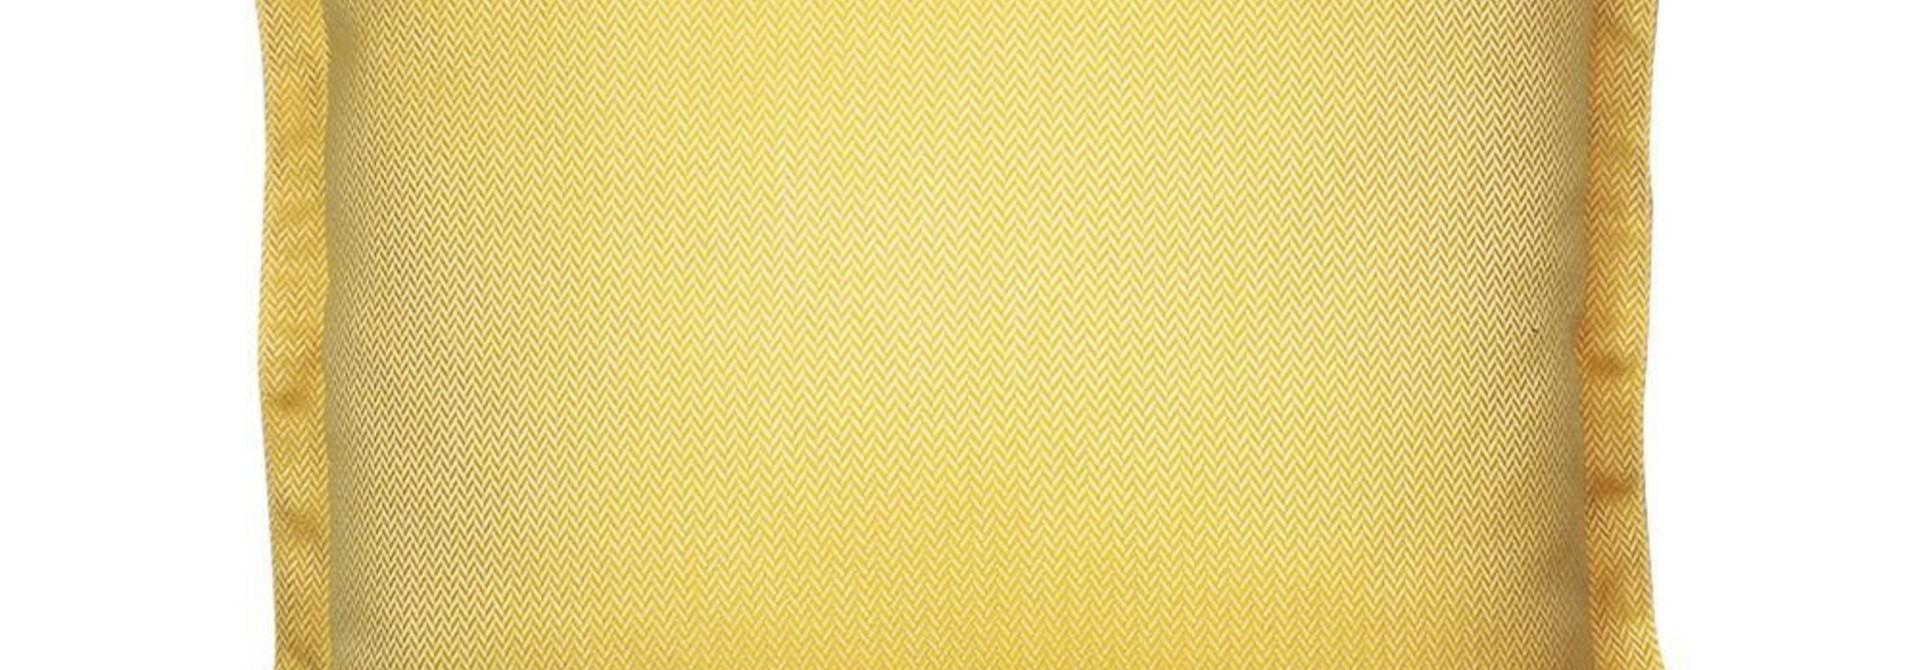 OU EST MARIUS - Luxe Chevron Sunshine Cushion 50x50cm